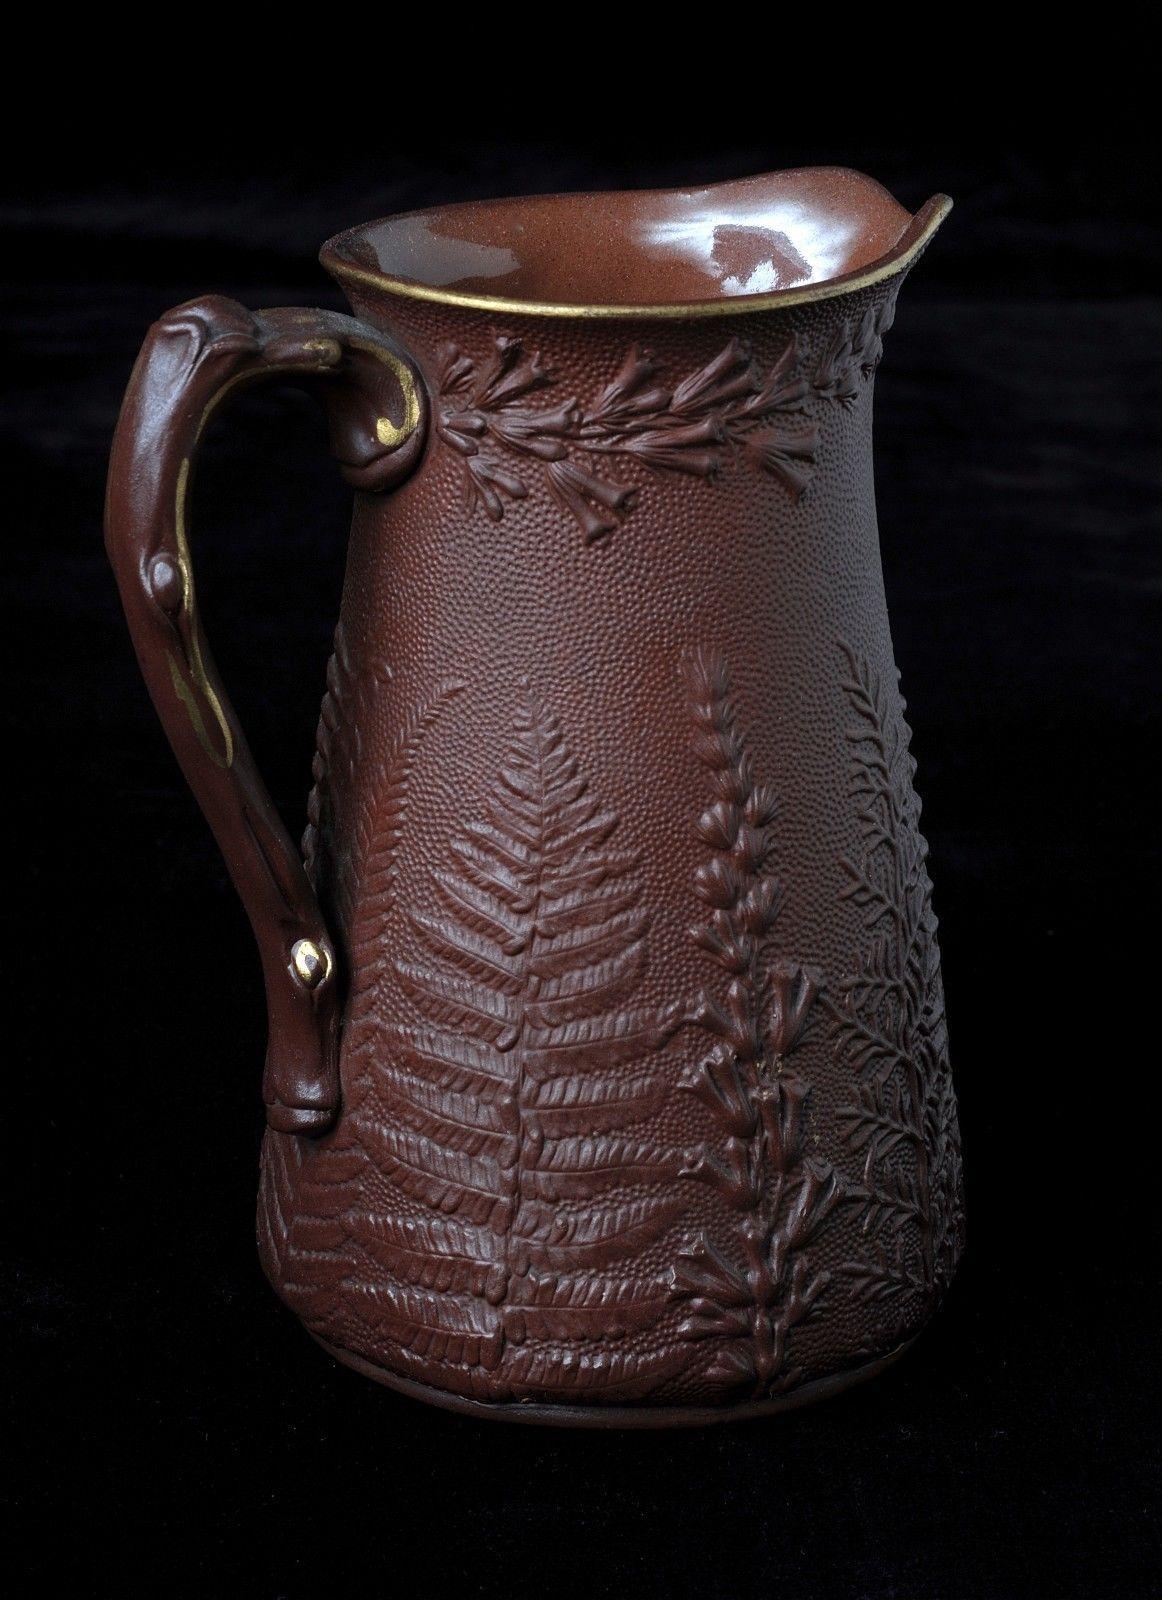 Antique Brown Ceramic Pitcher or Jug with Ferns Gold D Mark   eBay